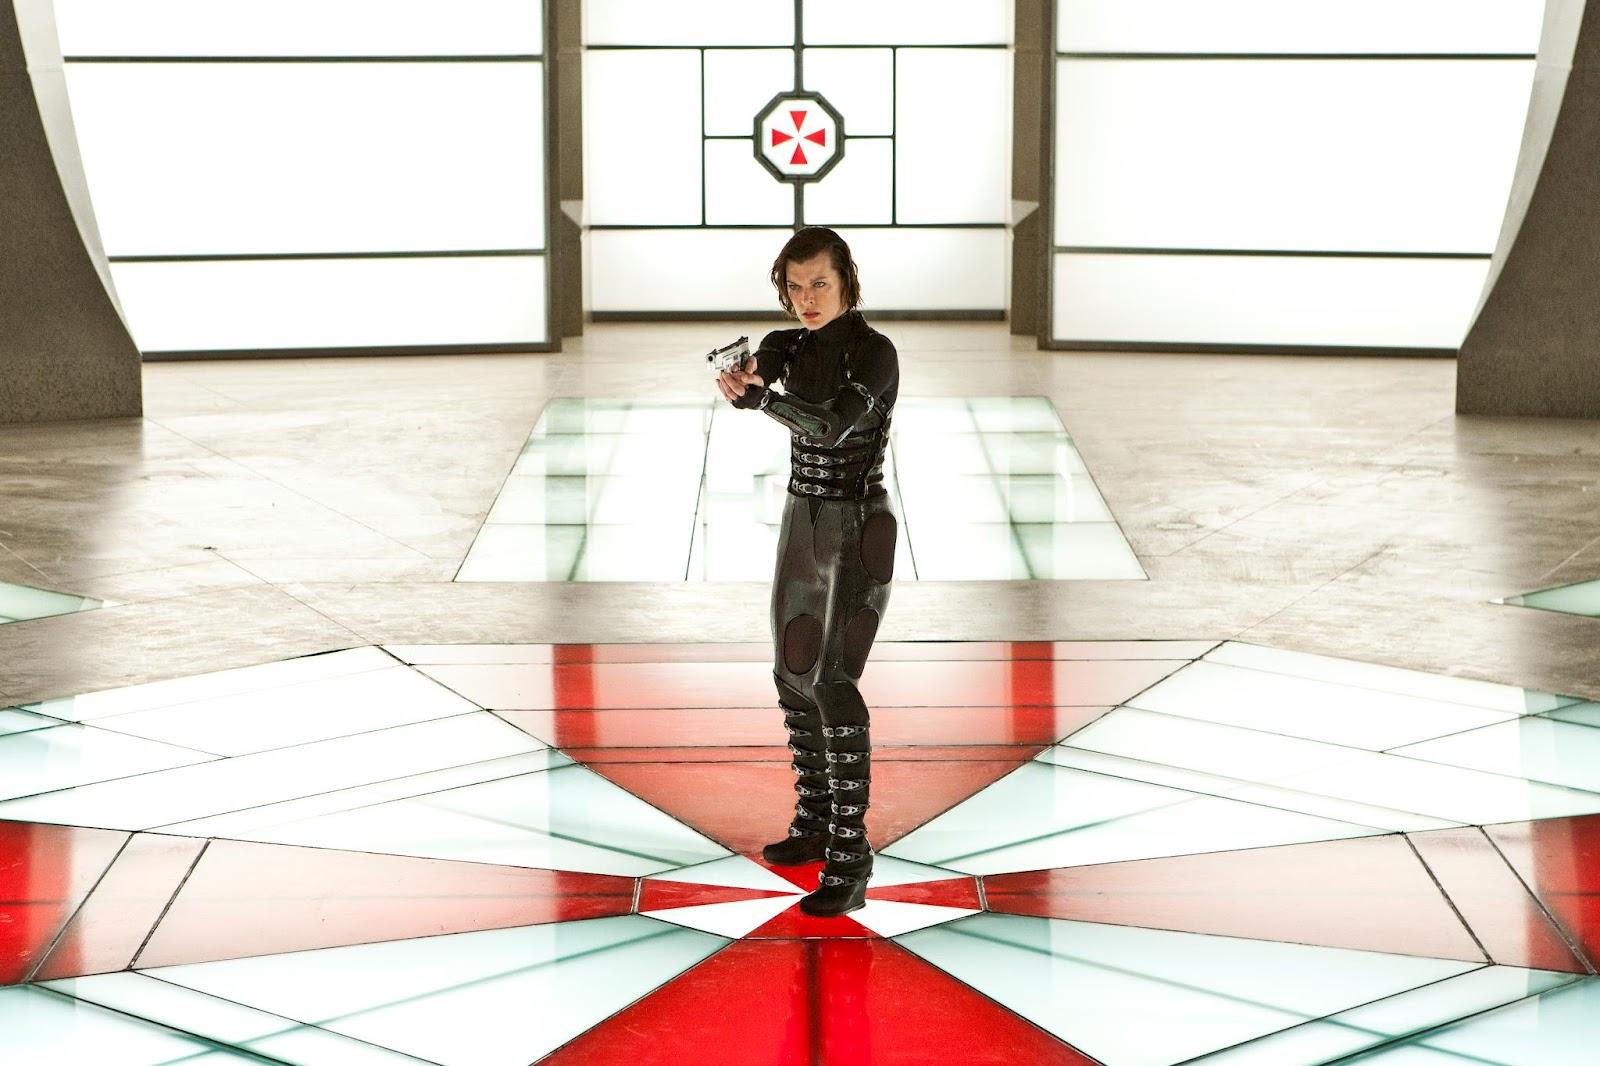 http://3.bp.blogspot.com/-bkWxYeaNGy4/UGAMemYoGnI/AAAAAAAABLM/0hXZTx_bLWU/s1600/Resident_Evil+_5_la_venganza.jpg